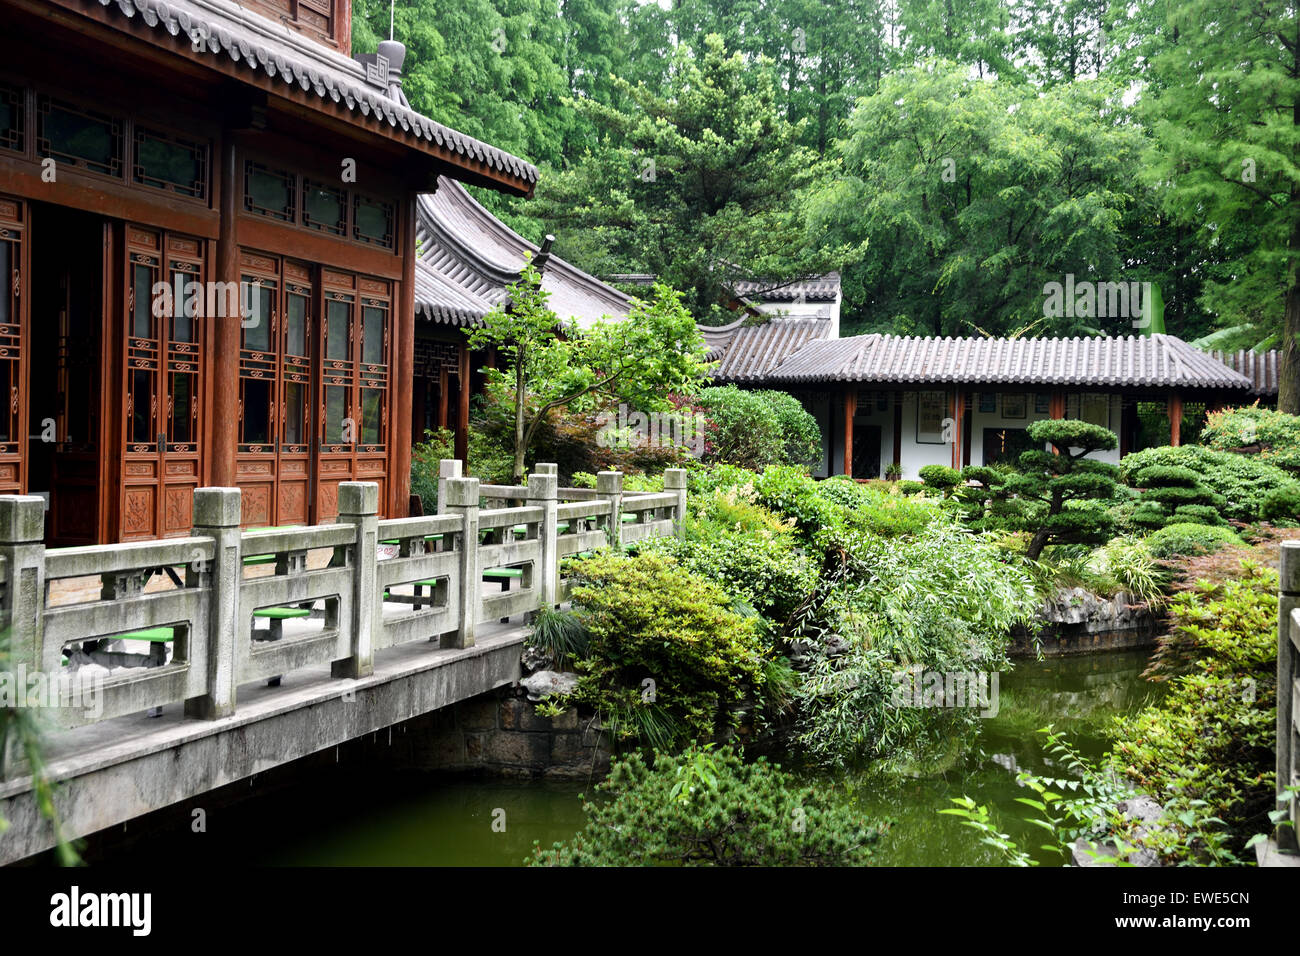 La Shanghai Giardino Botanico Xuhui District cinese Cina Immagini Stock